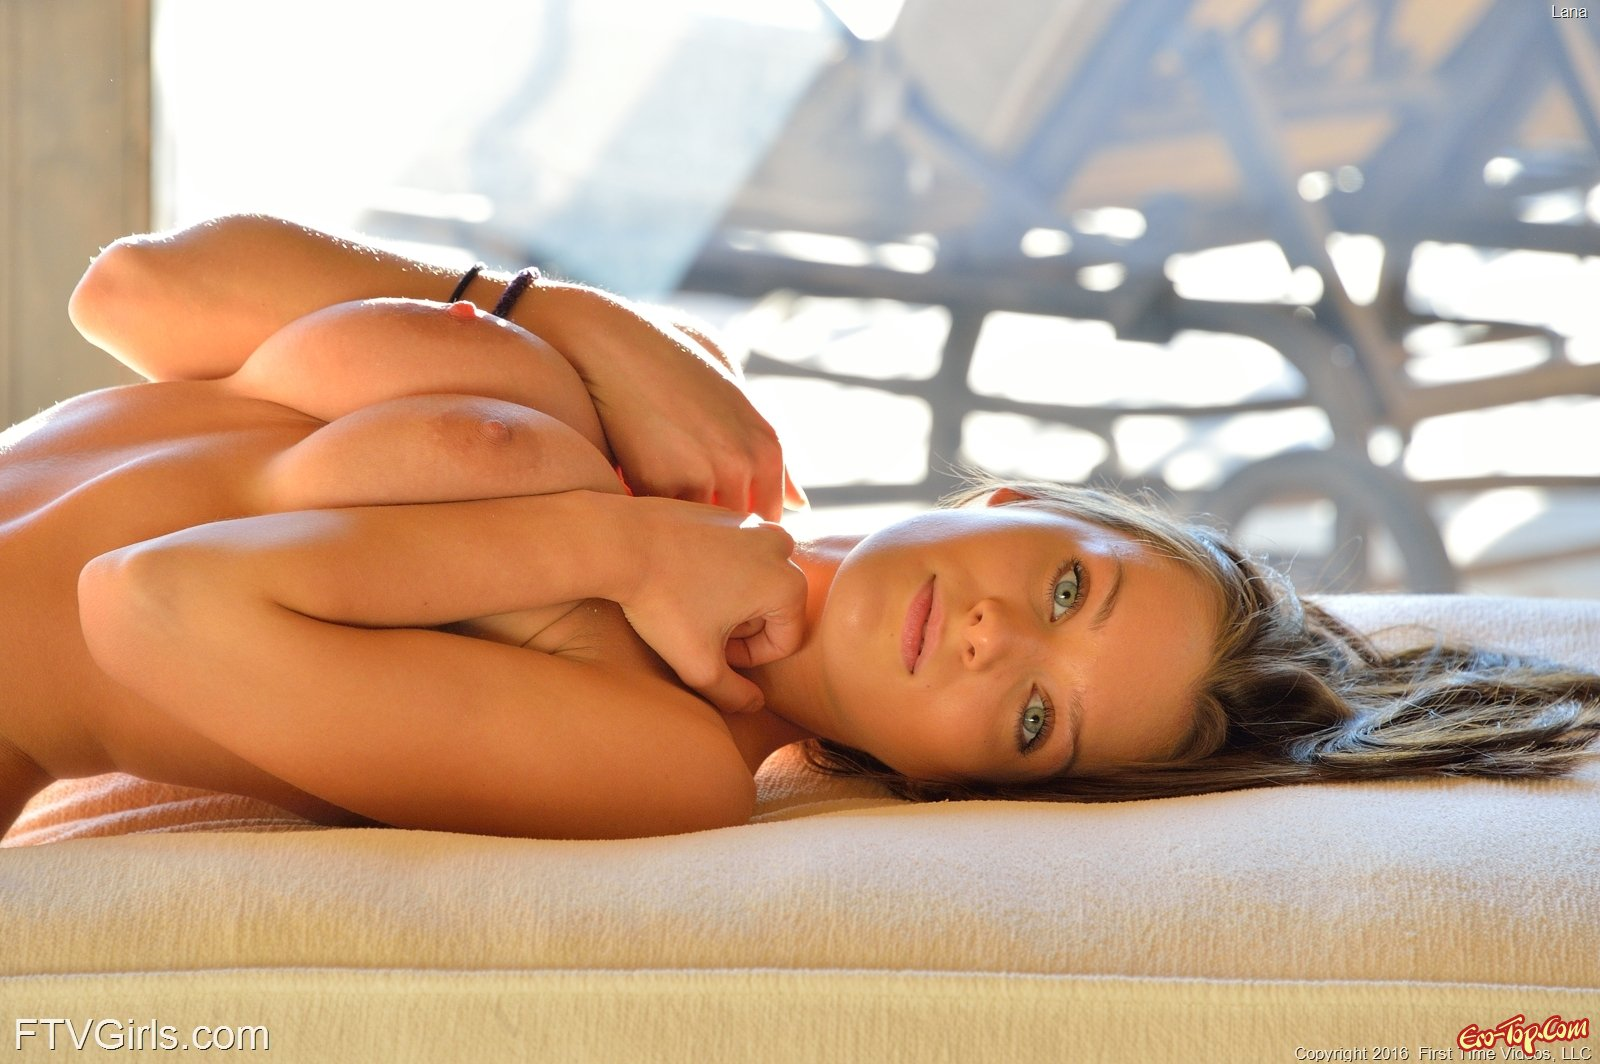 Раздетая красотка секс фото